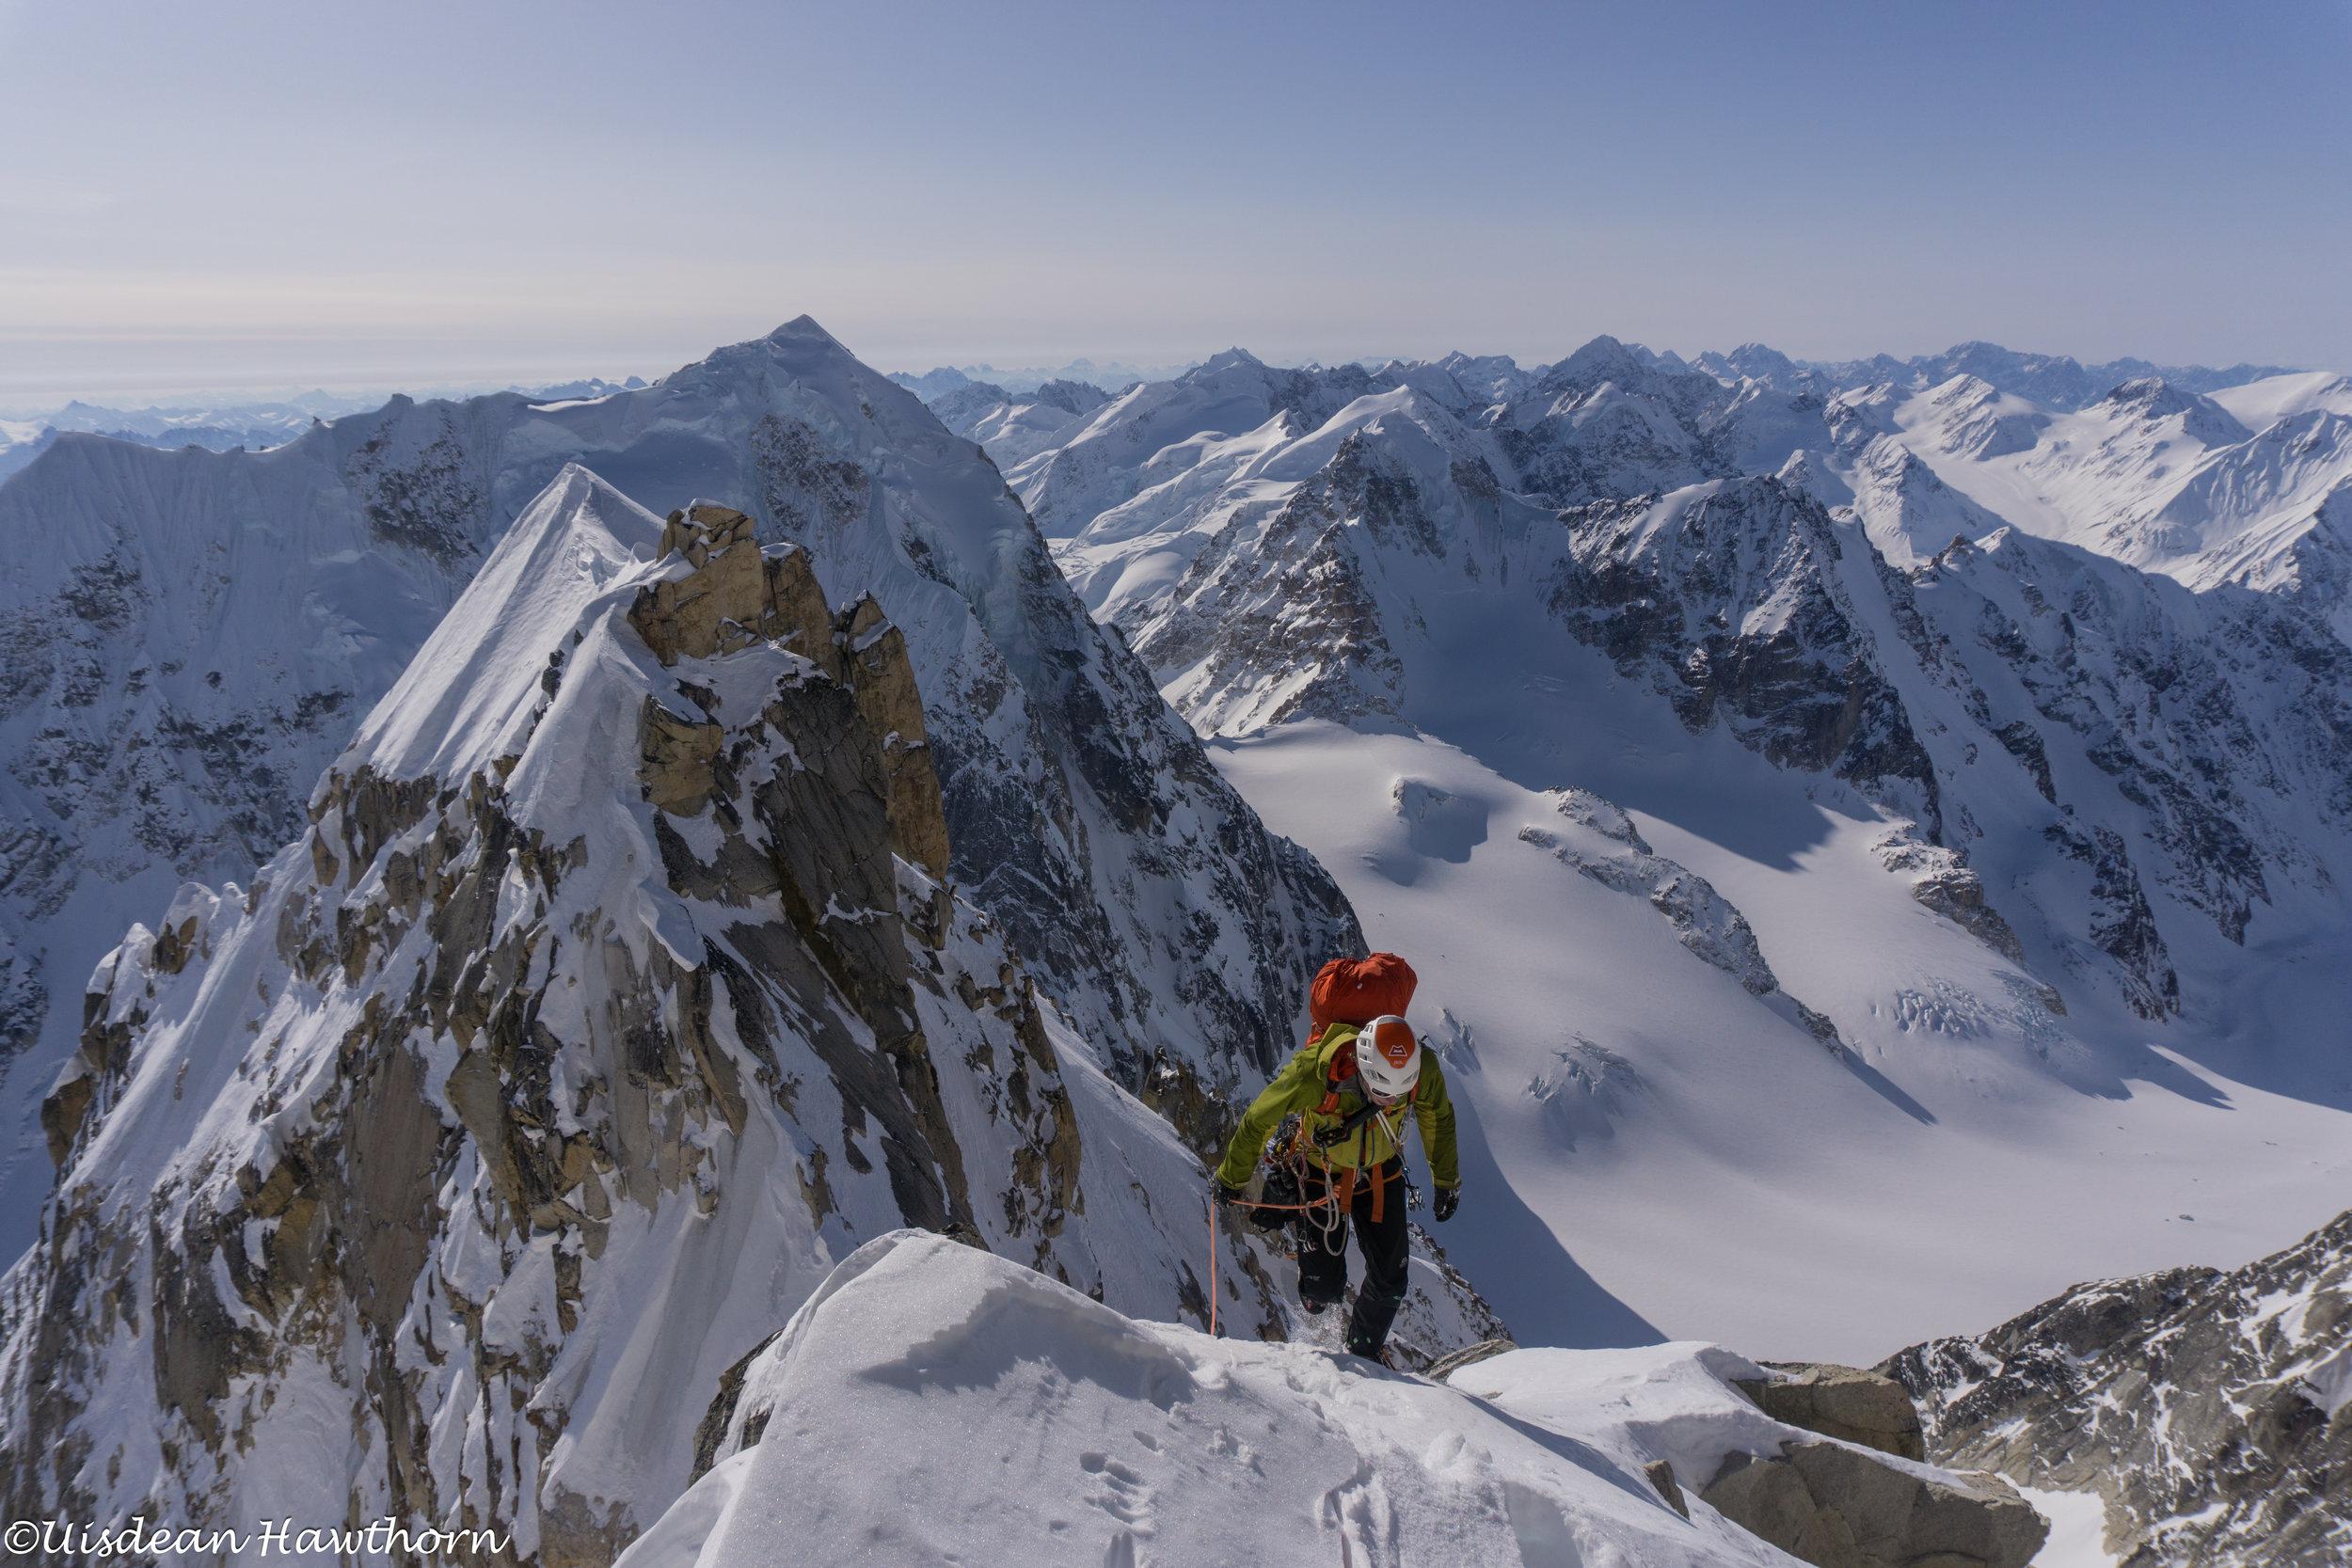 Tom on 'Fun or Fear' (ED2), Mt. Jezebel, Revelation Mountains, Alaska. First ascent. photo: Uisdean Hawthorn